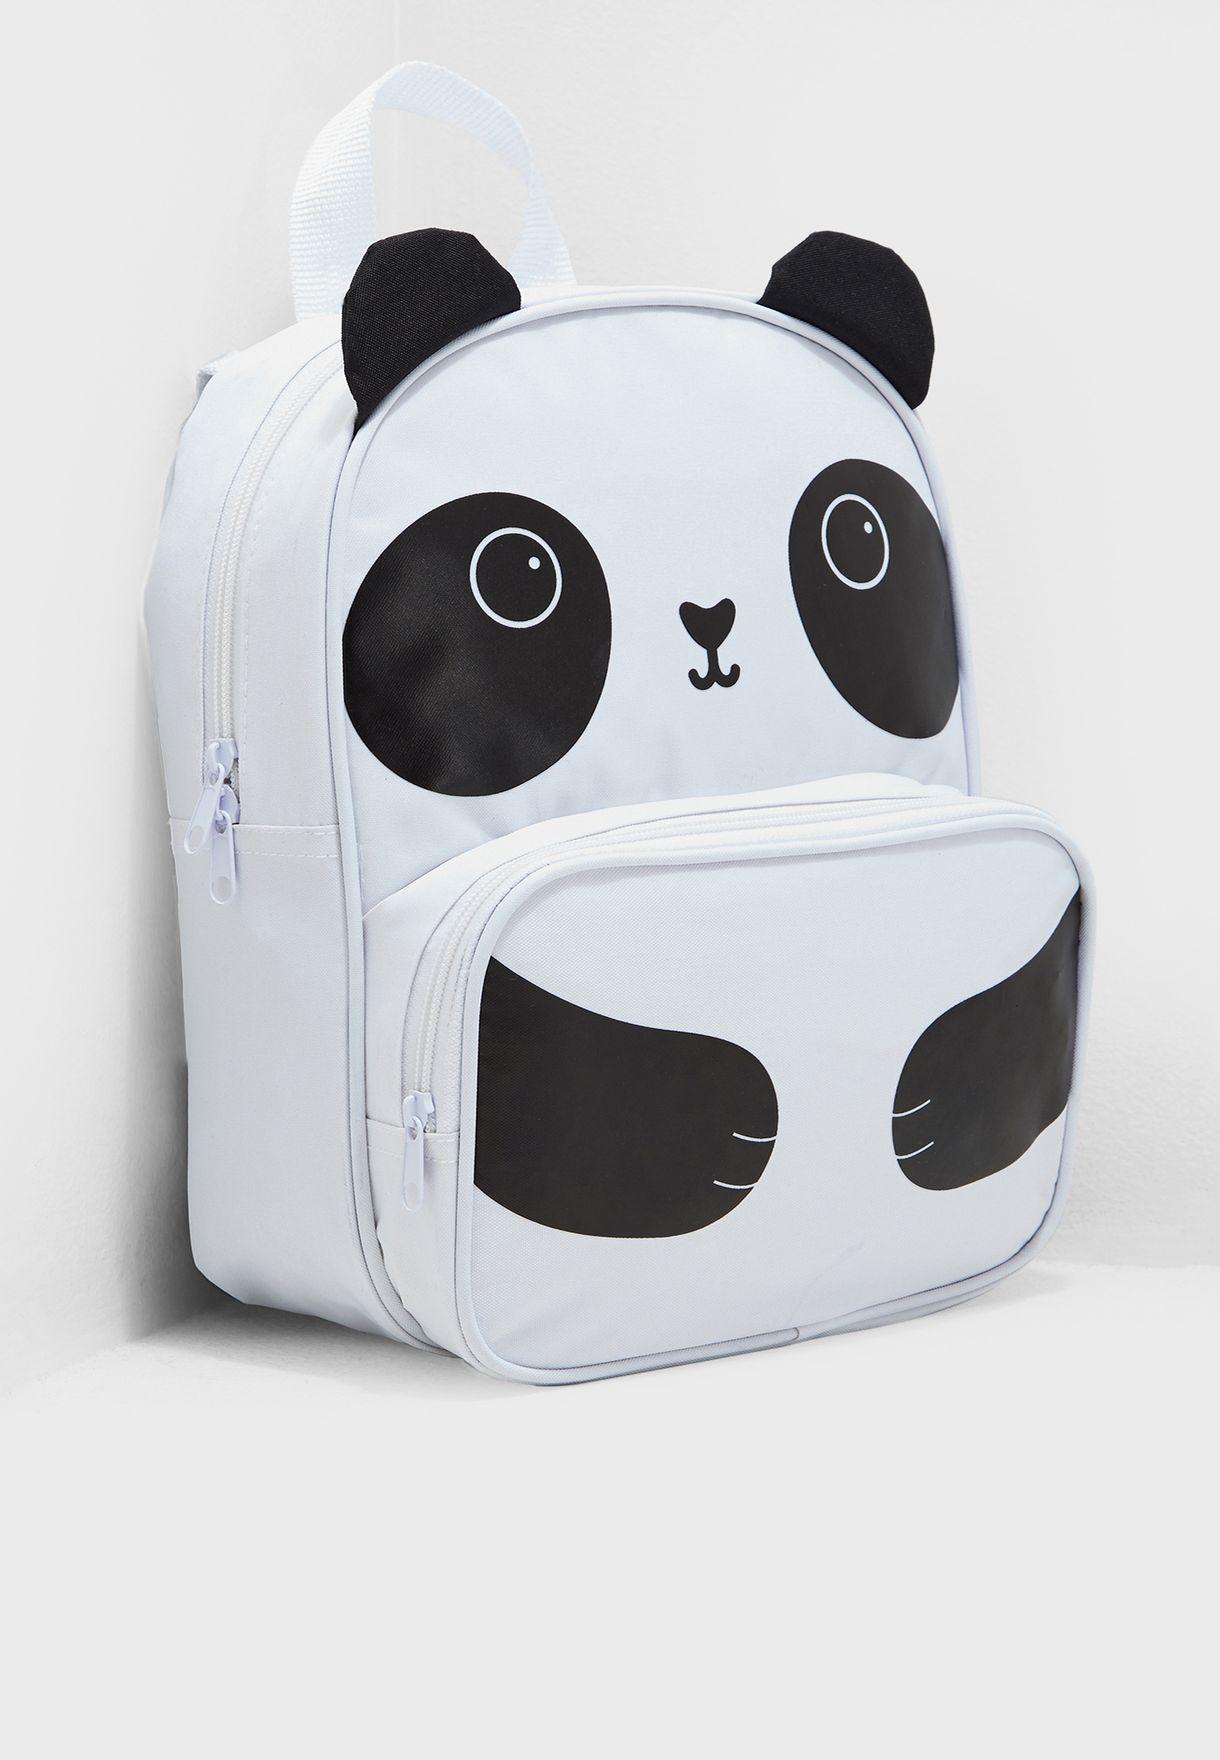 b3d947e35fa4 Shop Sass   Belle monochrome Kids Panda Backpack VAL022 for Kids in ...